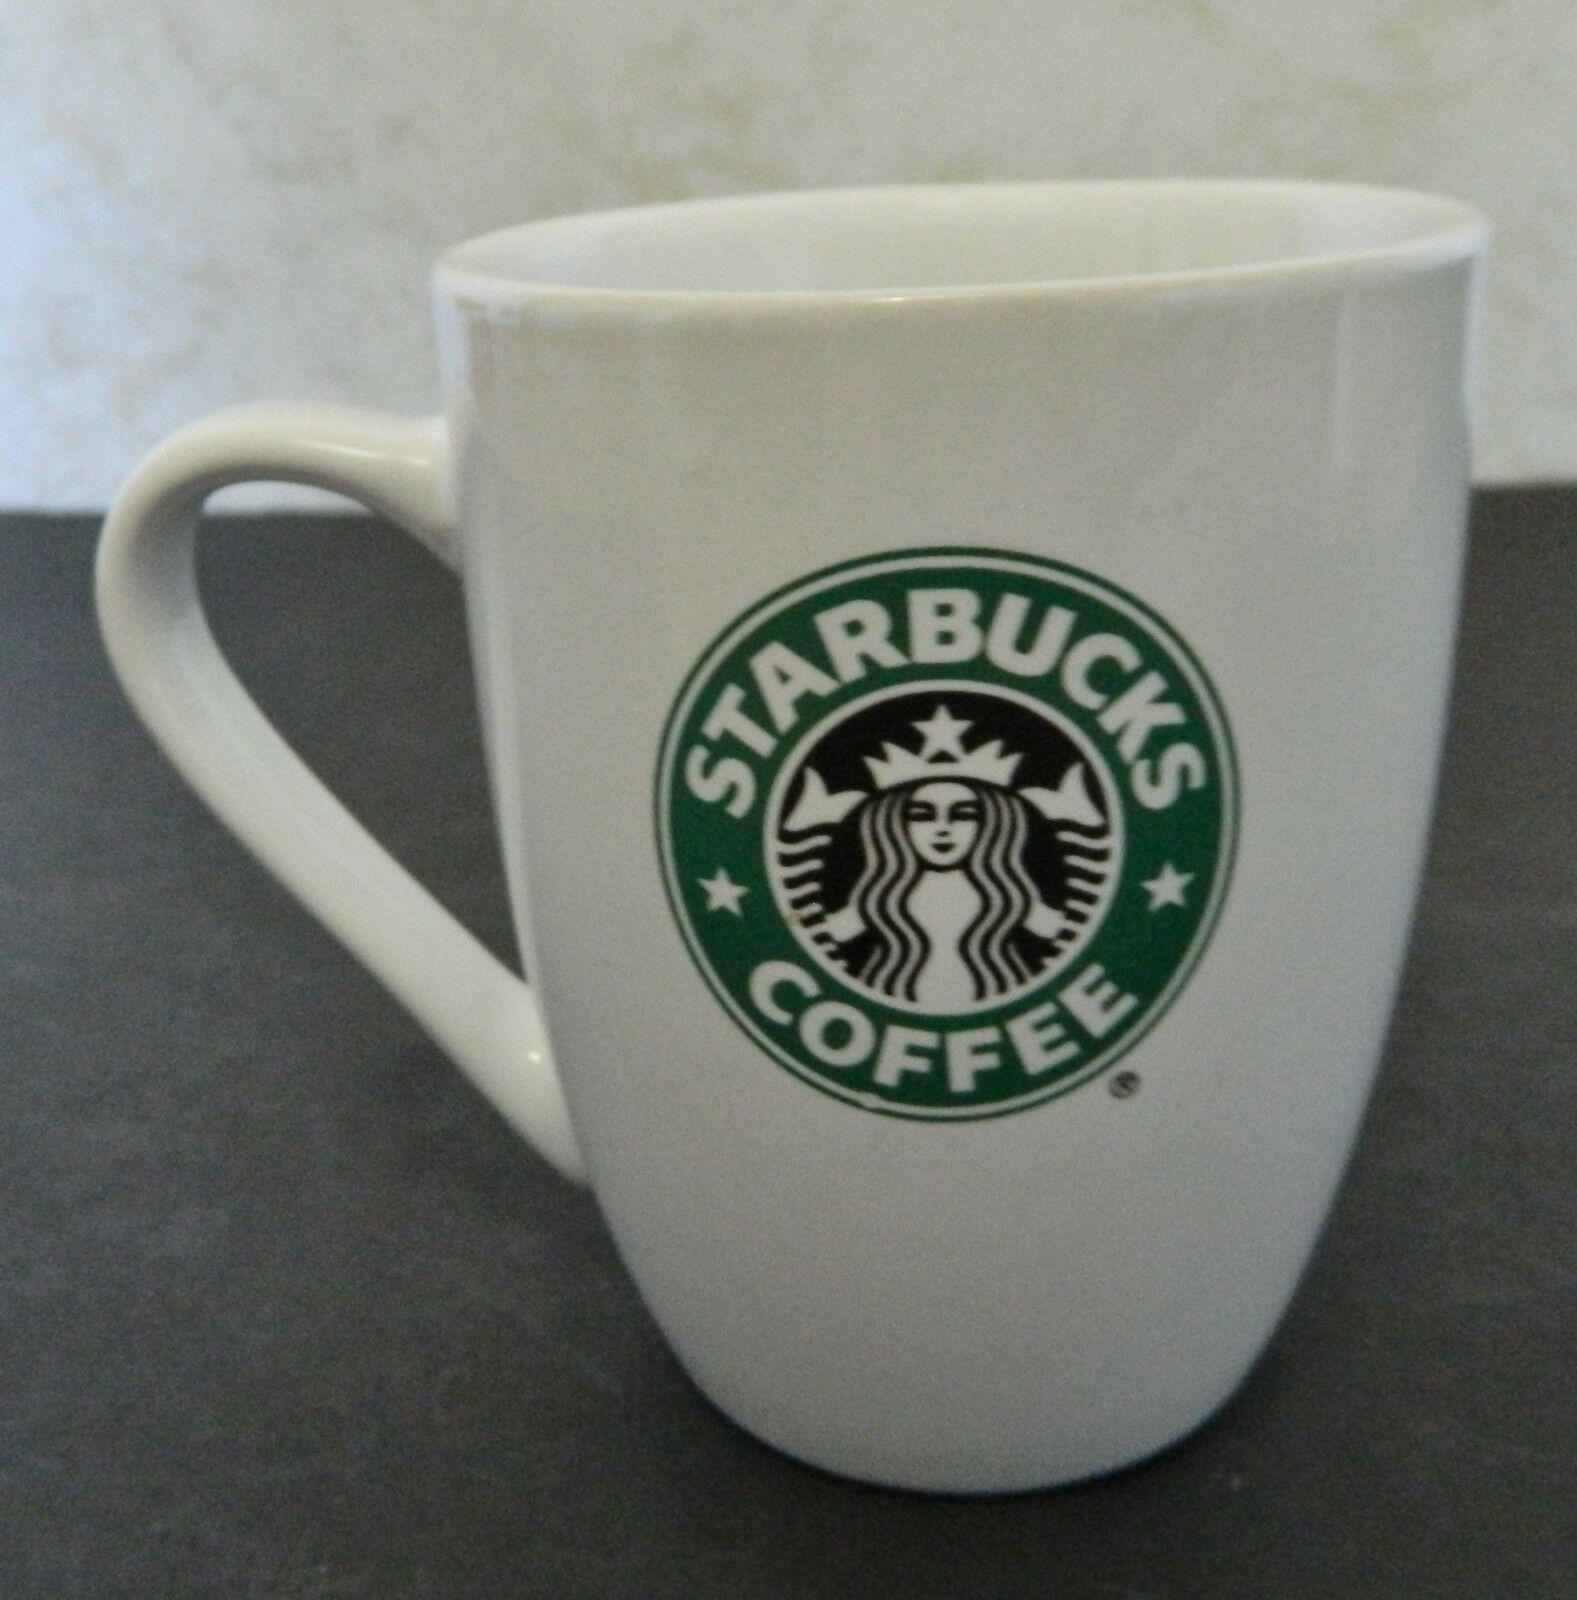 Starbucks Cobalt Blue Glass Cup Mug Coffee Tea Mermaid Siren Logo EUC White